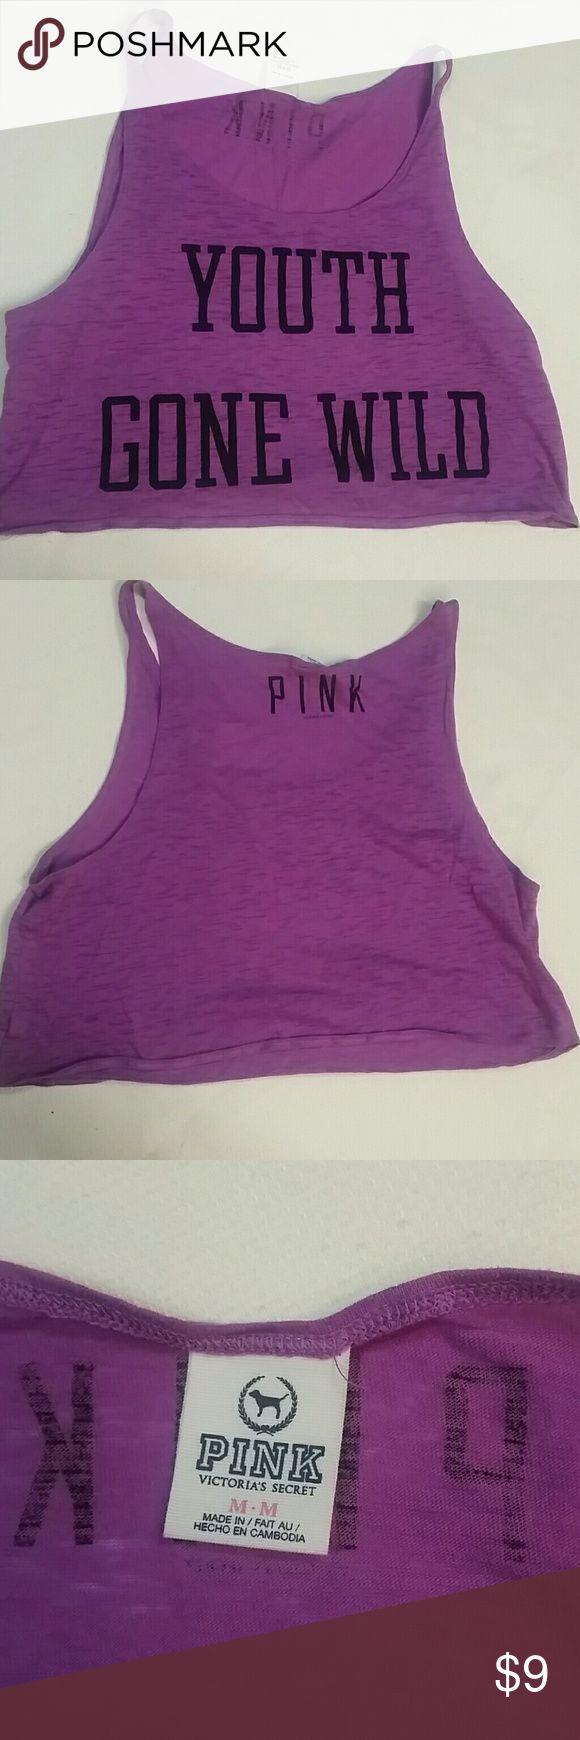 Victoria's secret pink tank Victoria's secret pink cropped loose tank, M PINK Victoria's Secret Tops Crop Tops